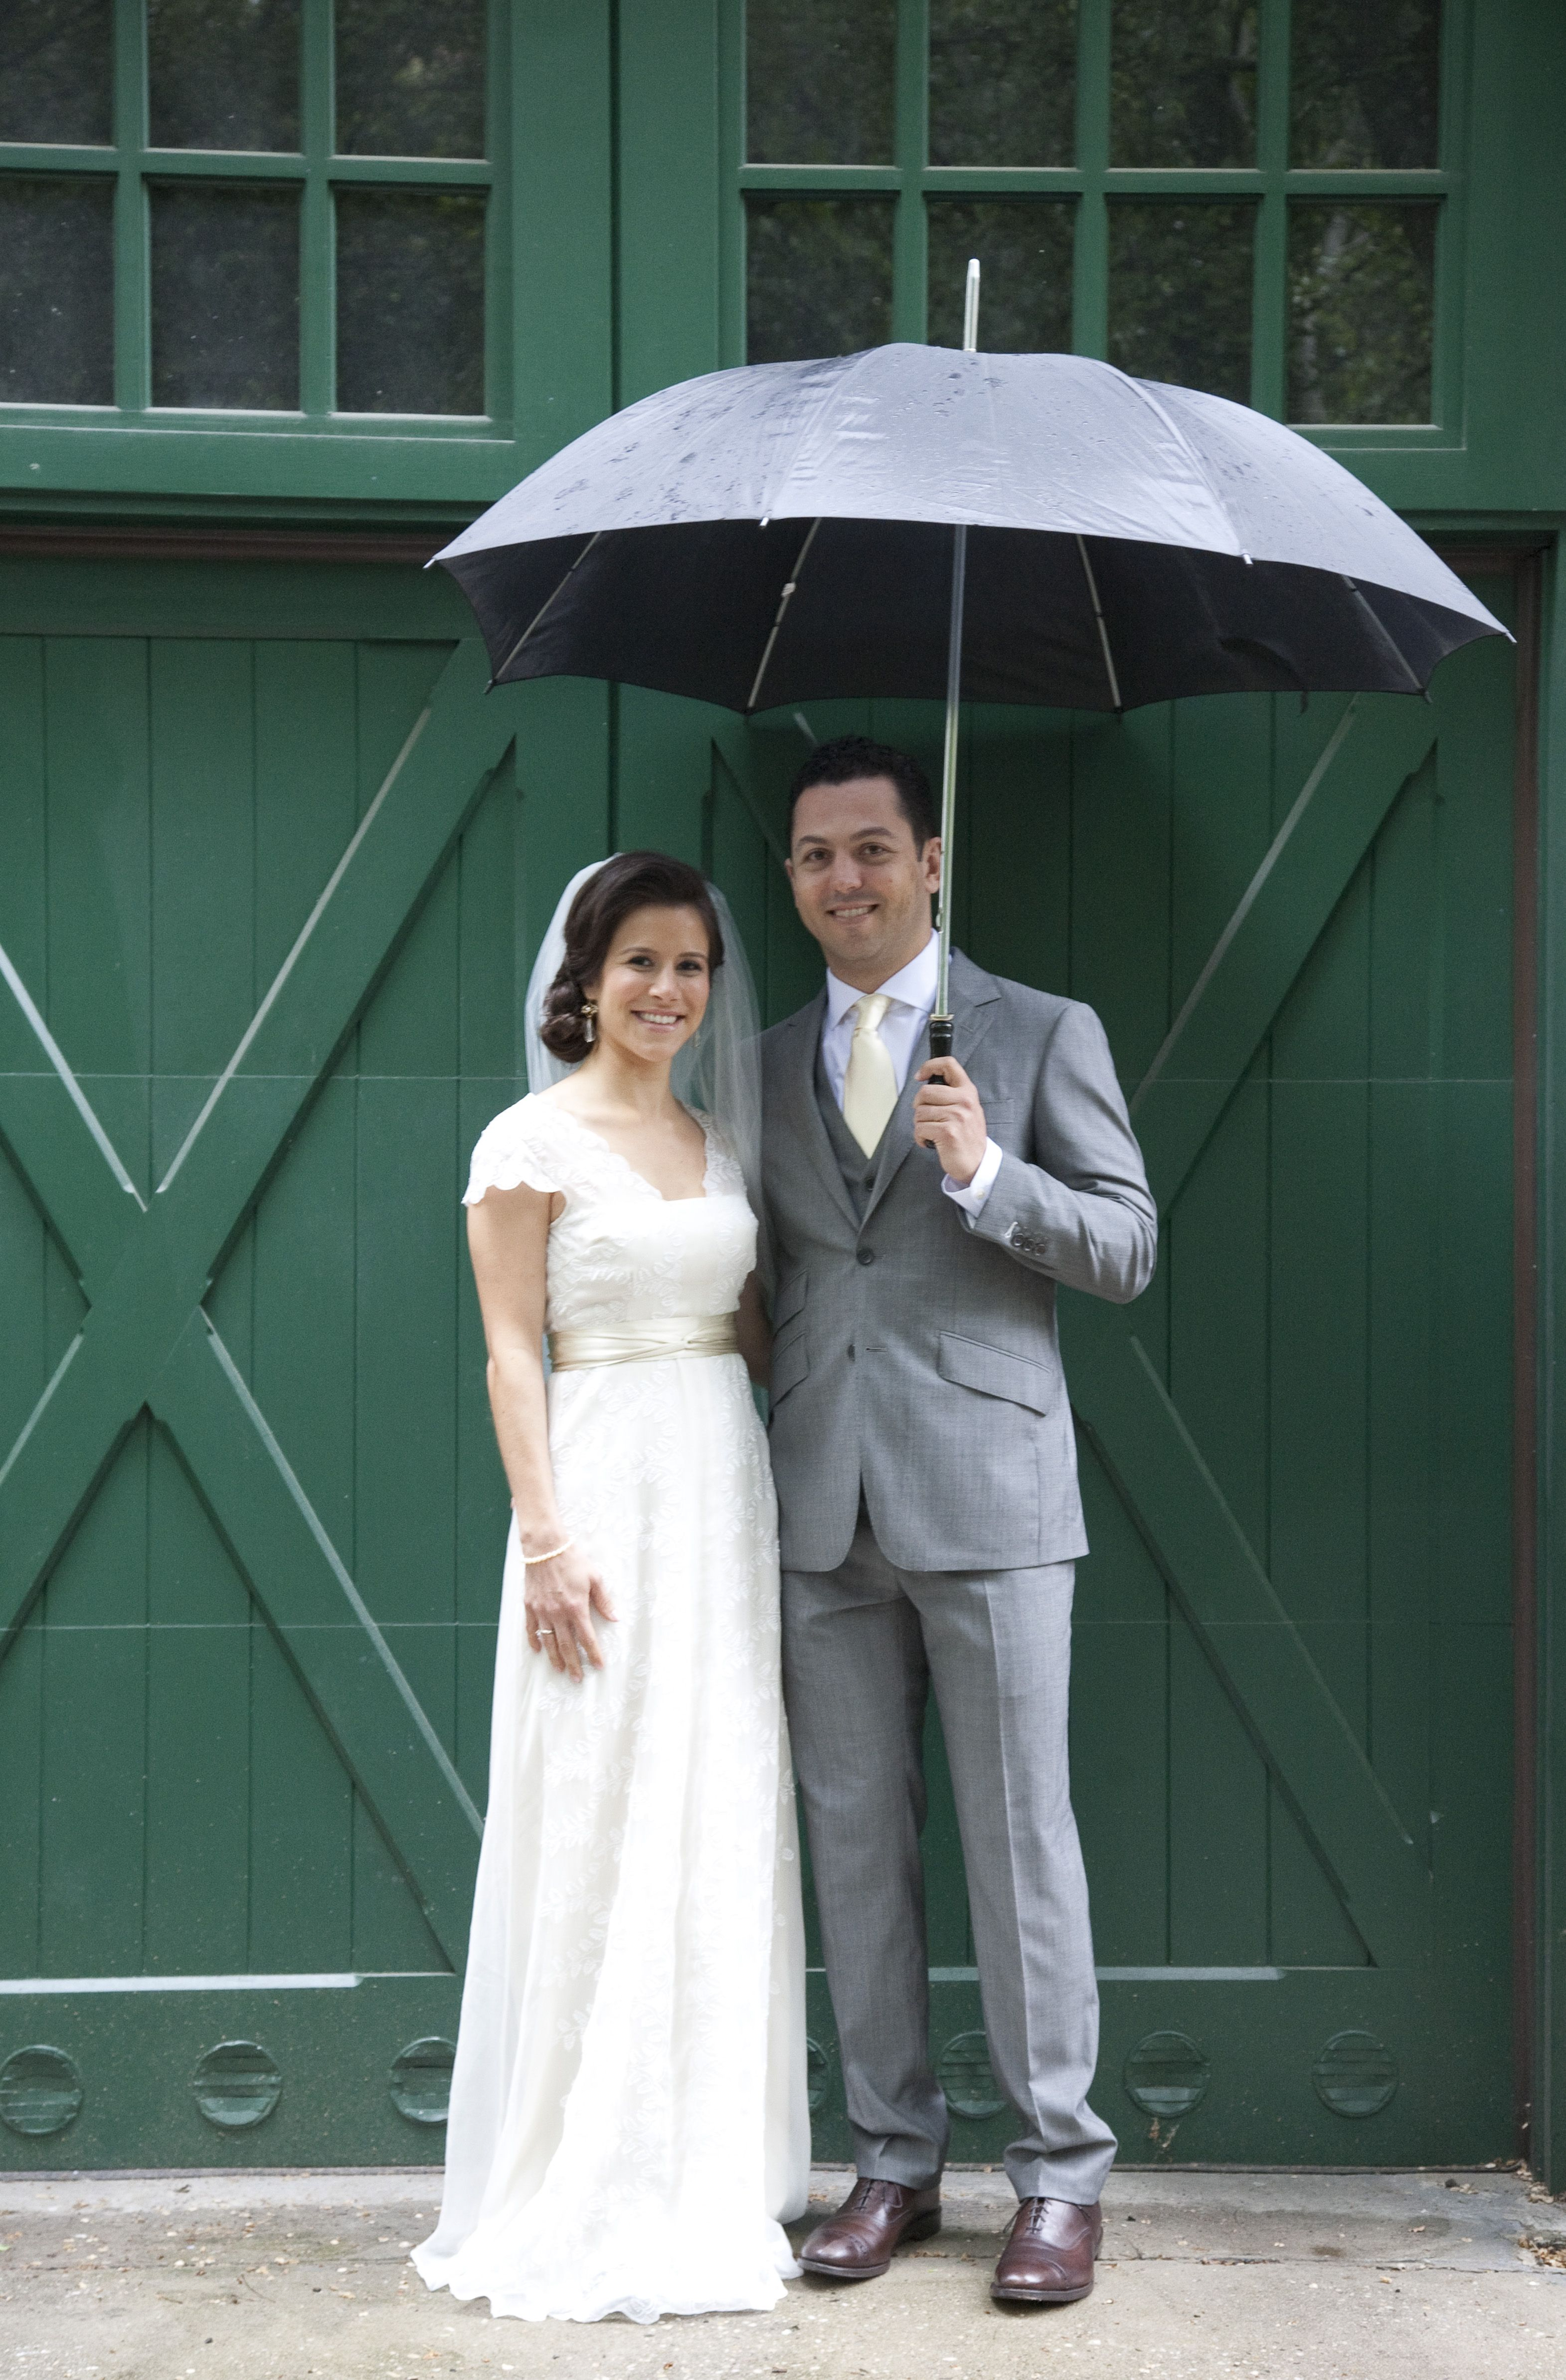 Saja wedding dresses style ld sajawedding planning for a